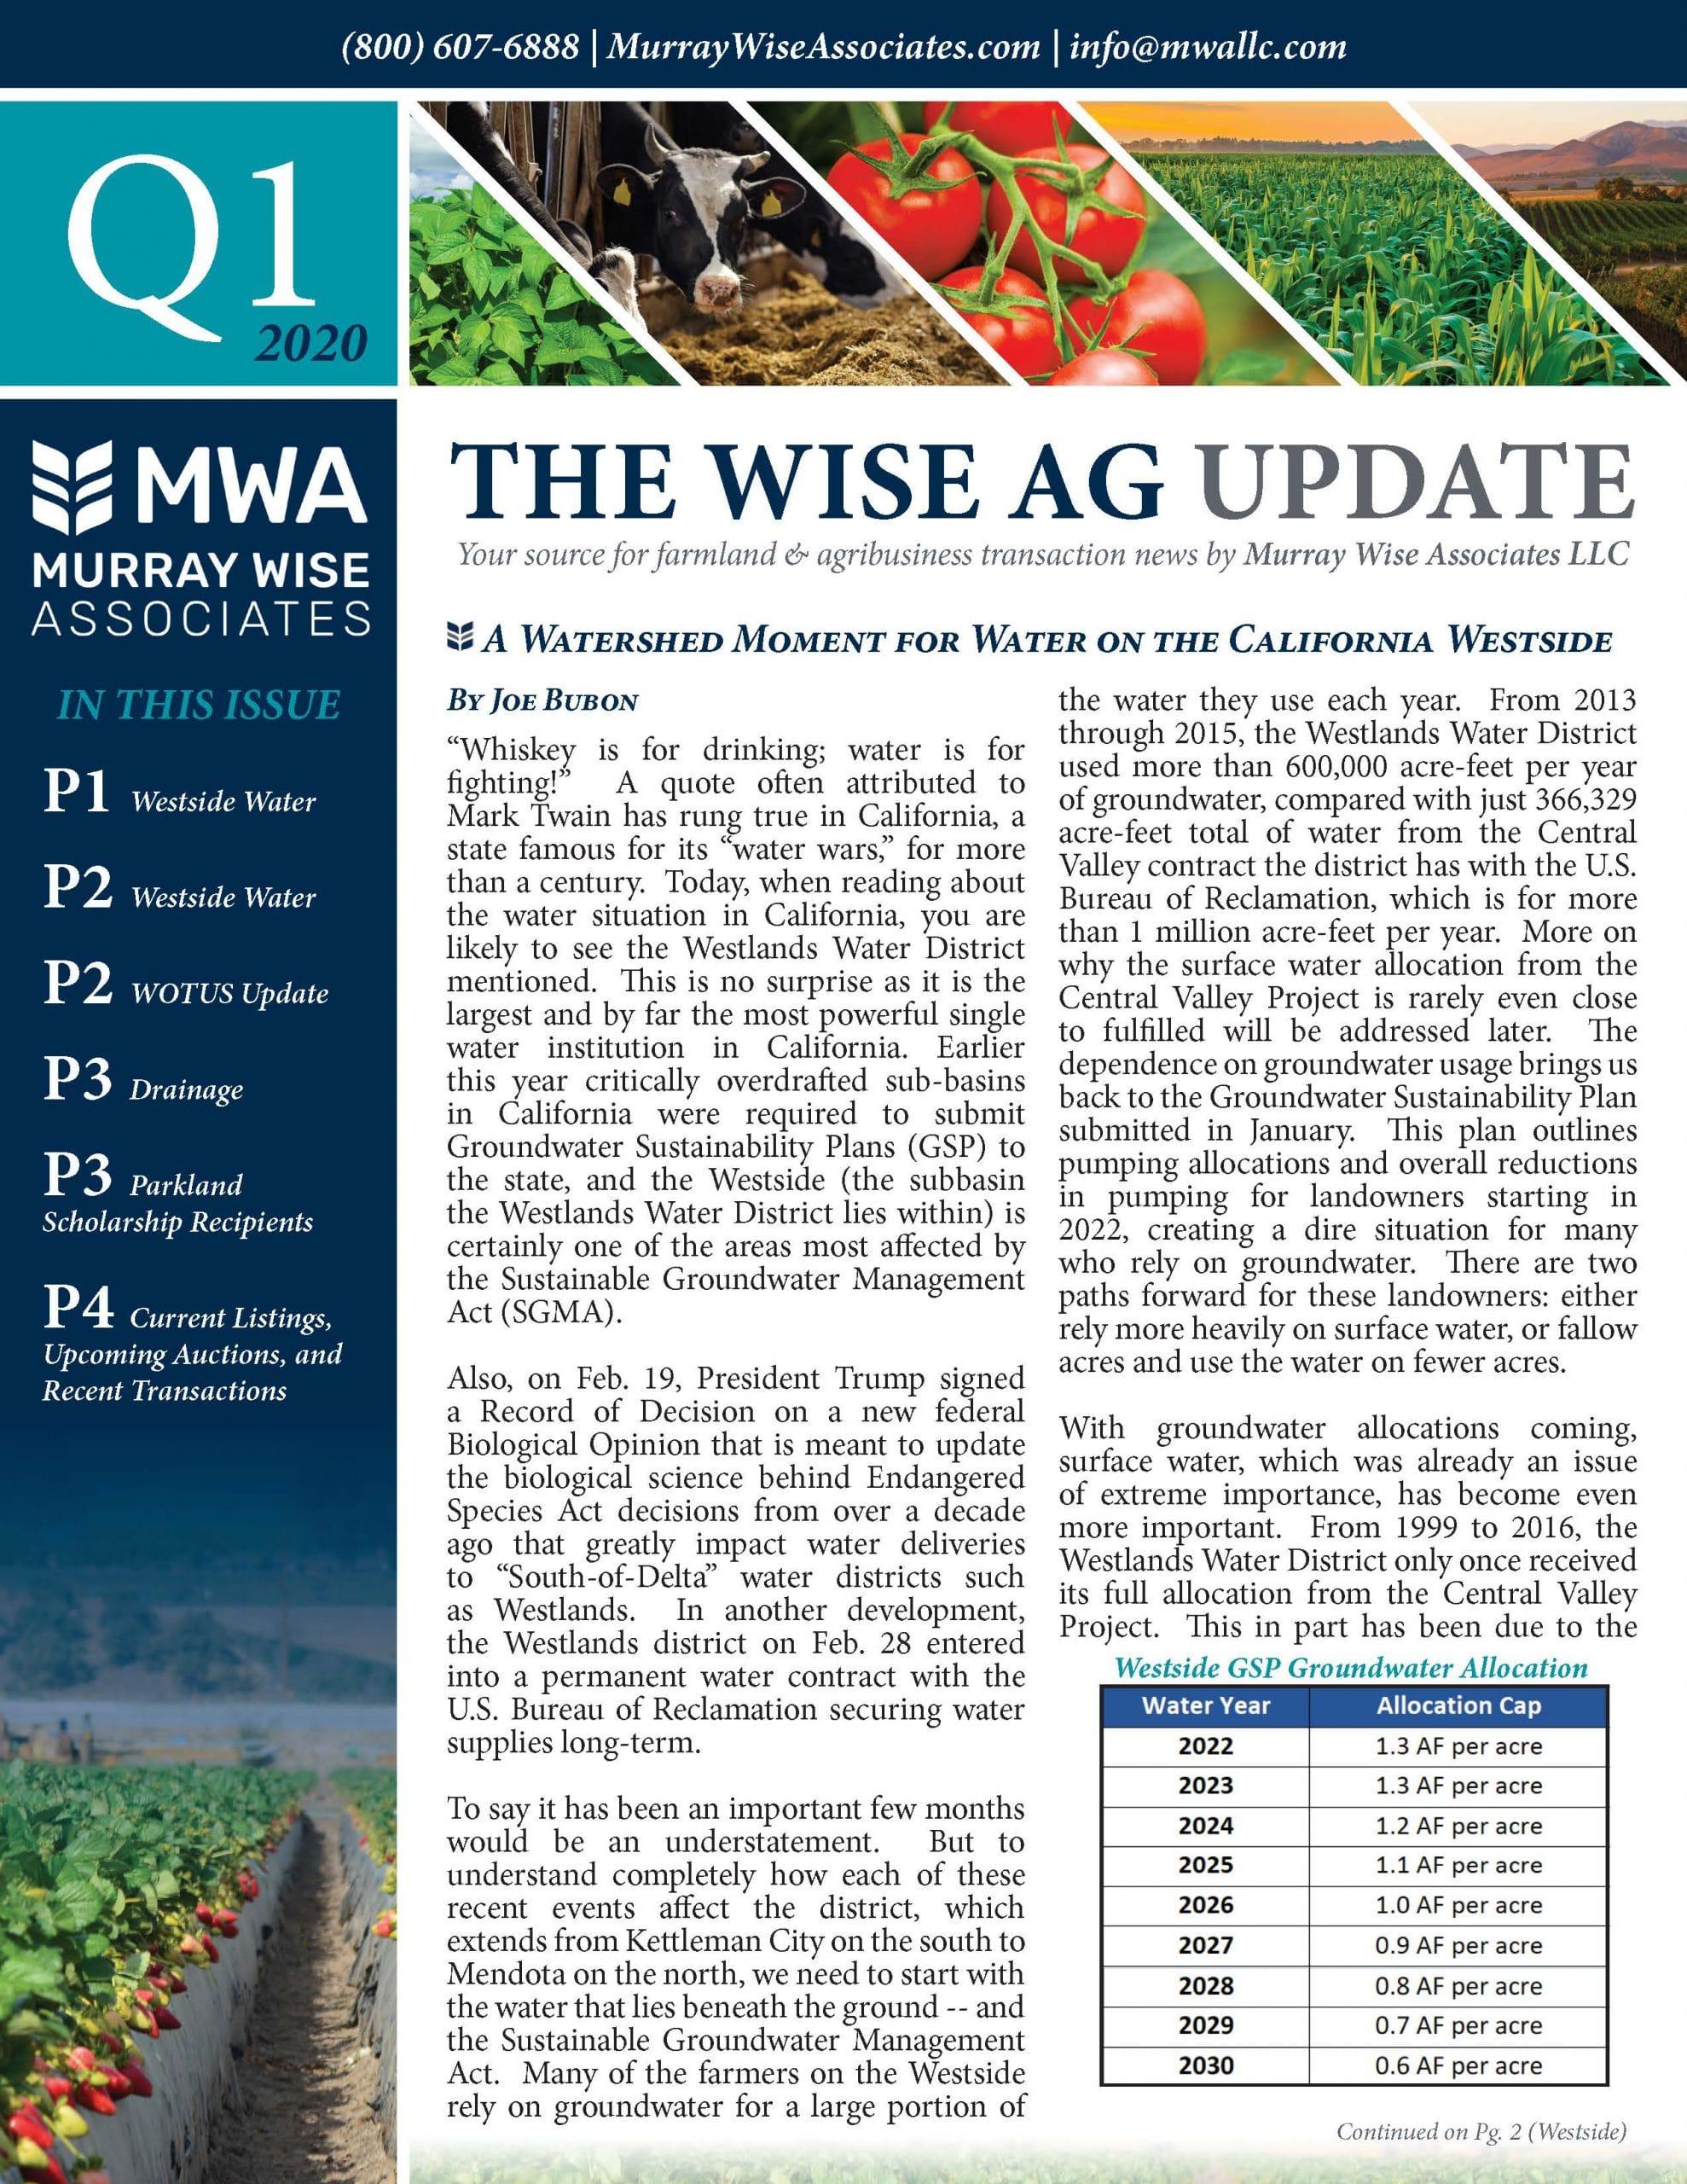 MWA Newsletter First Quarter 2020